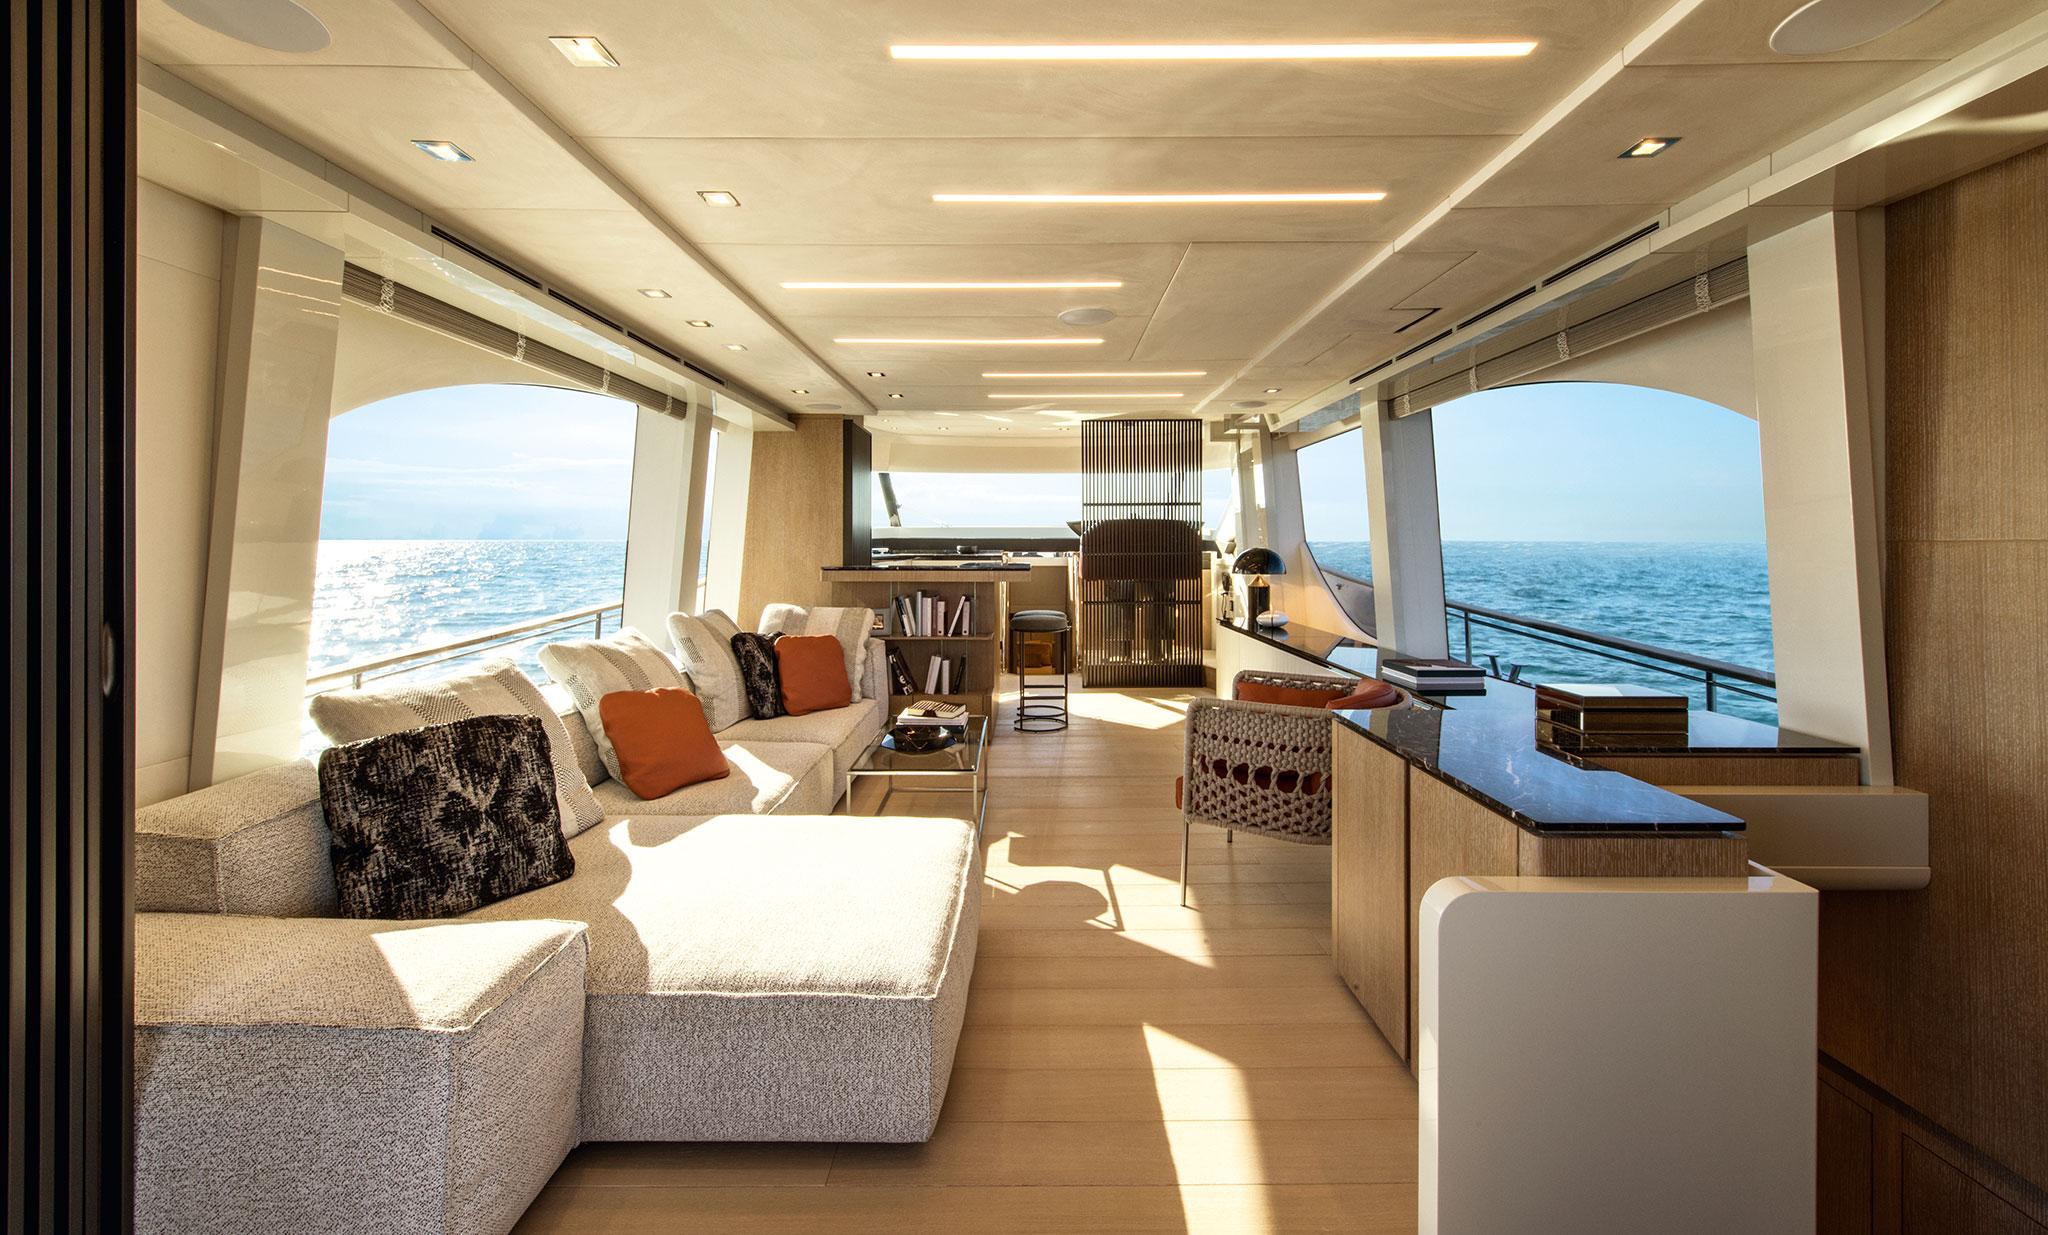 monte-carlo-yachts-70-Salon-yachts-france-172